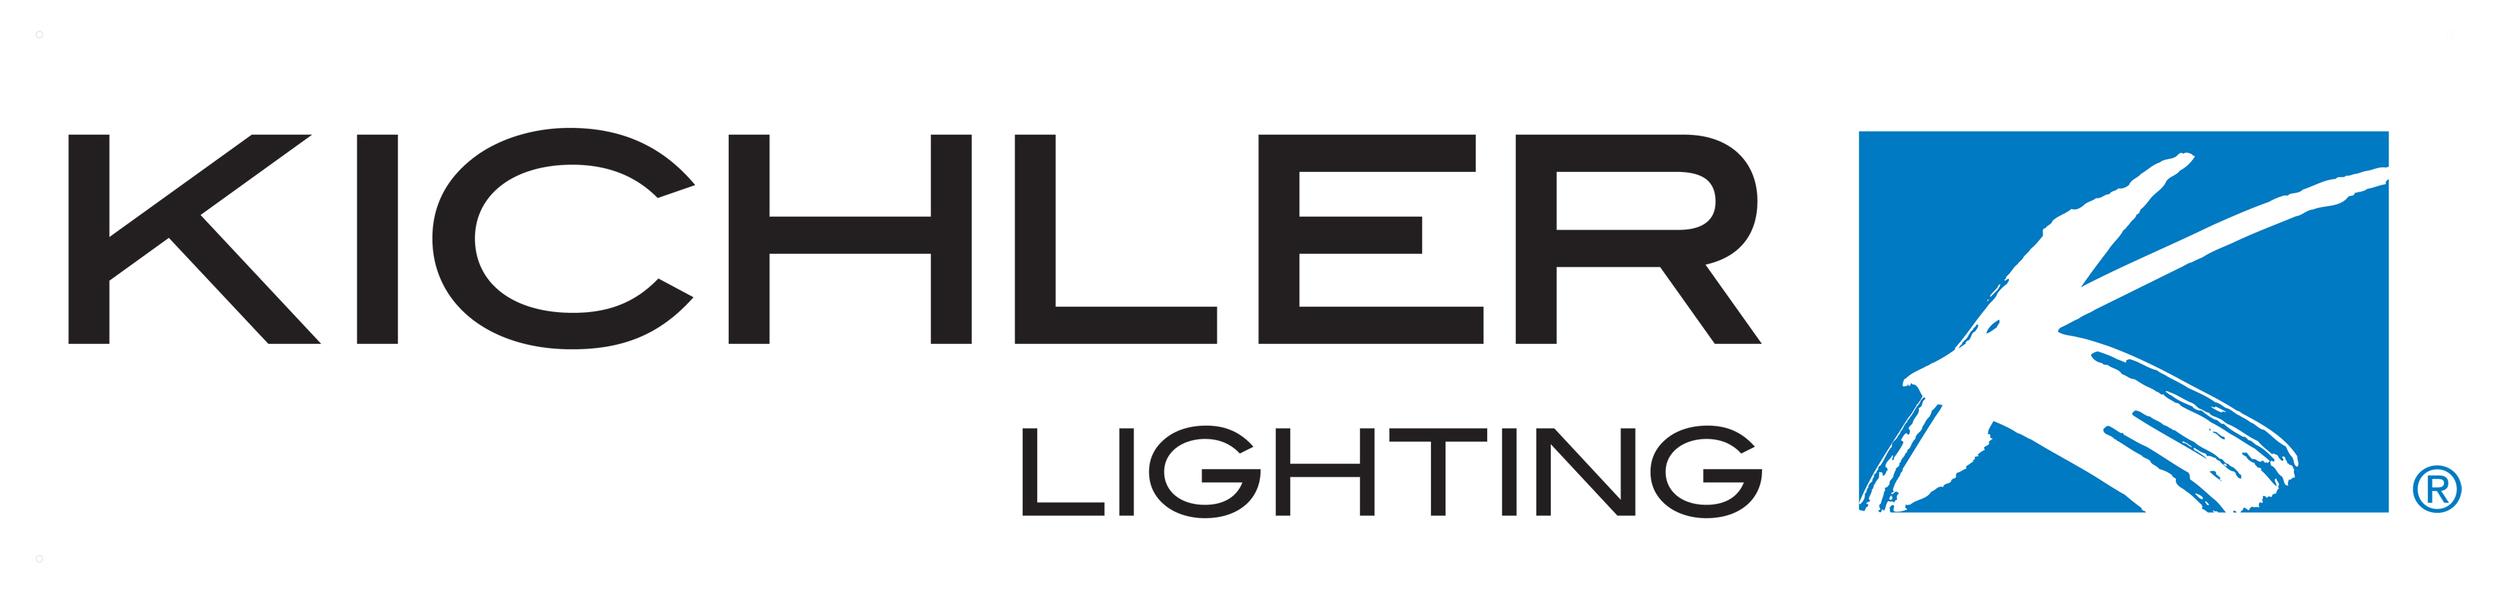 Kichler Lighting.jpeg